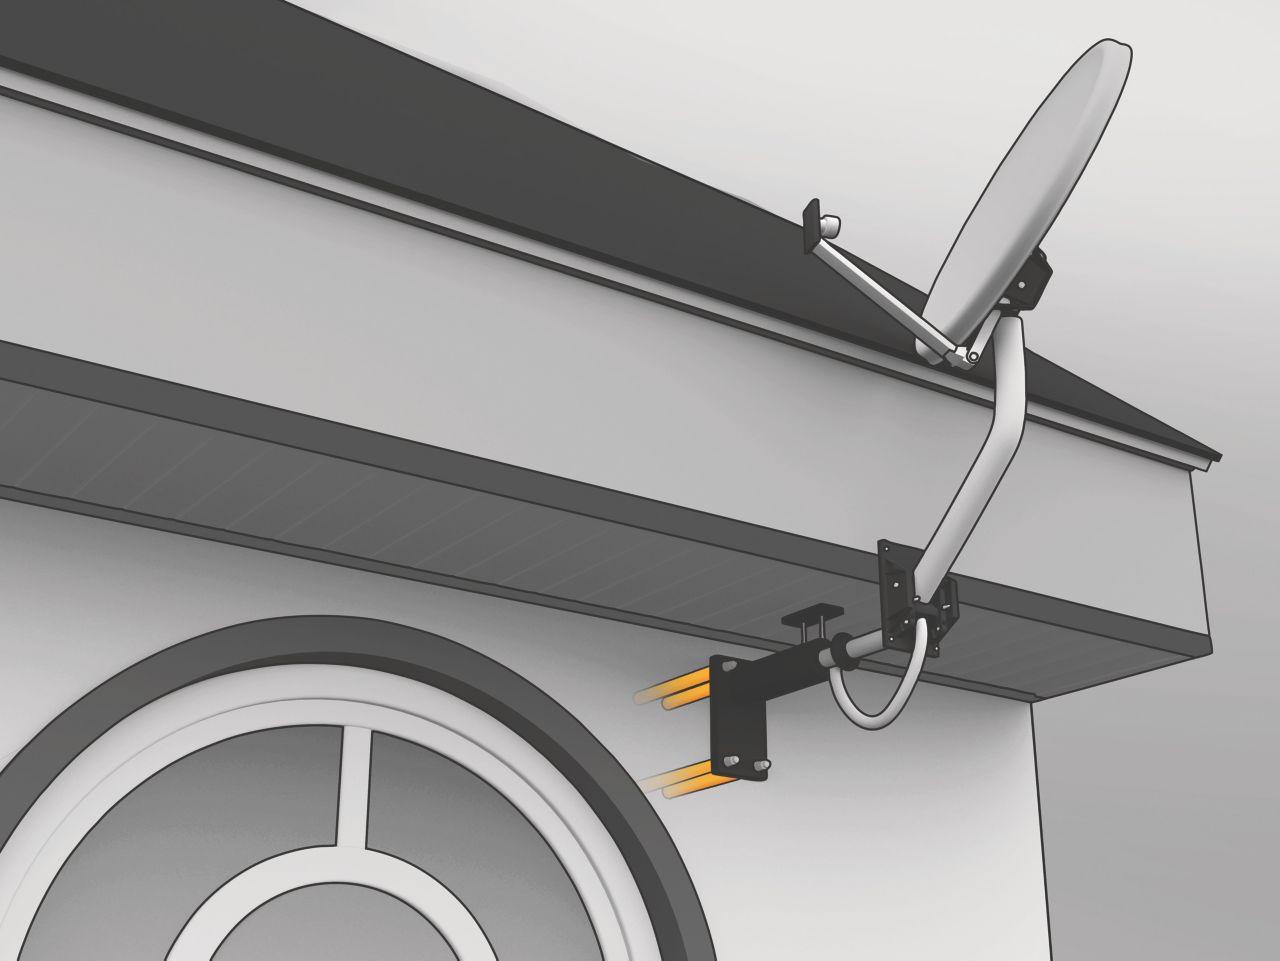 Parabolantenne forankret i betongvegg med Sika AnchorFix forankringslim